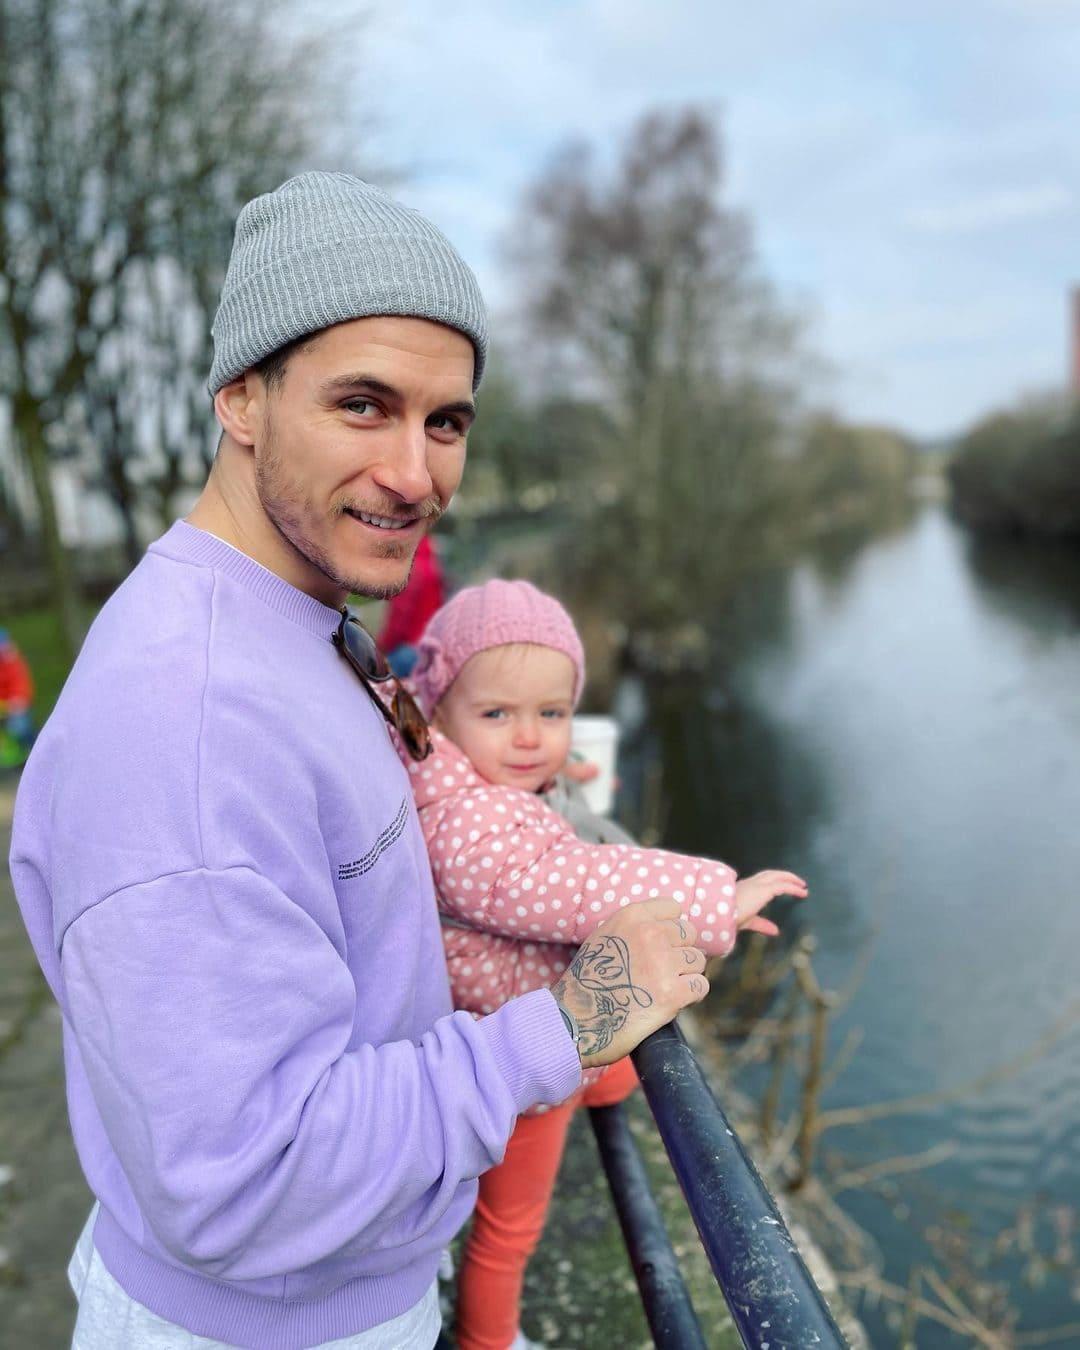 Gemma Atkinson's Husband Gorka, along with their child Mia